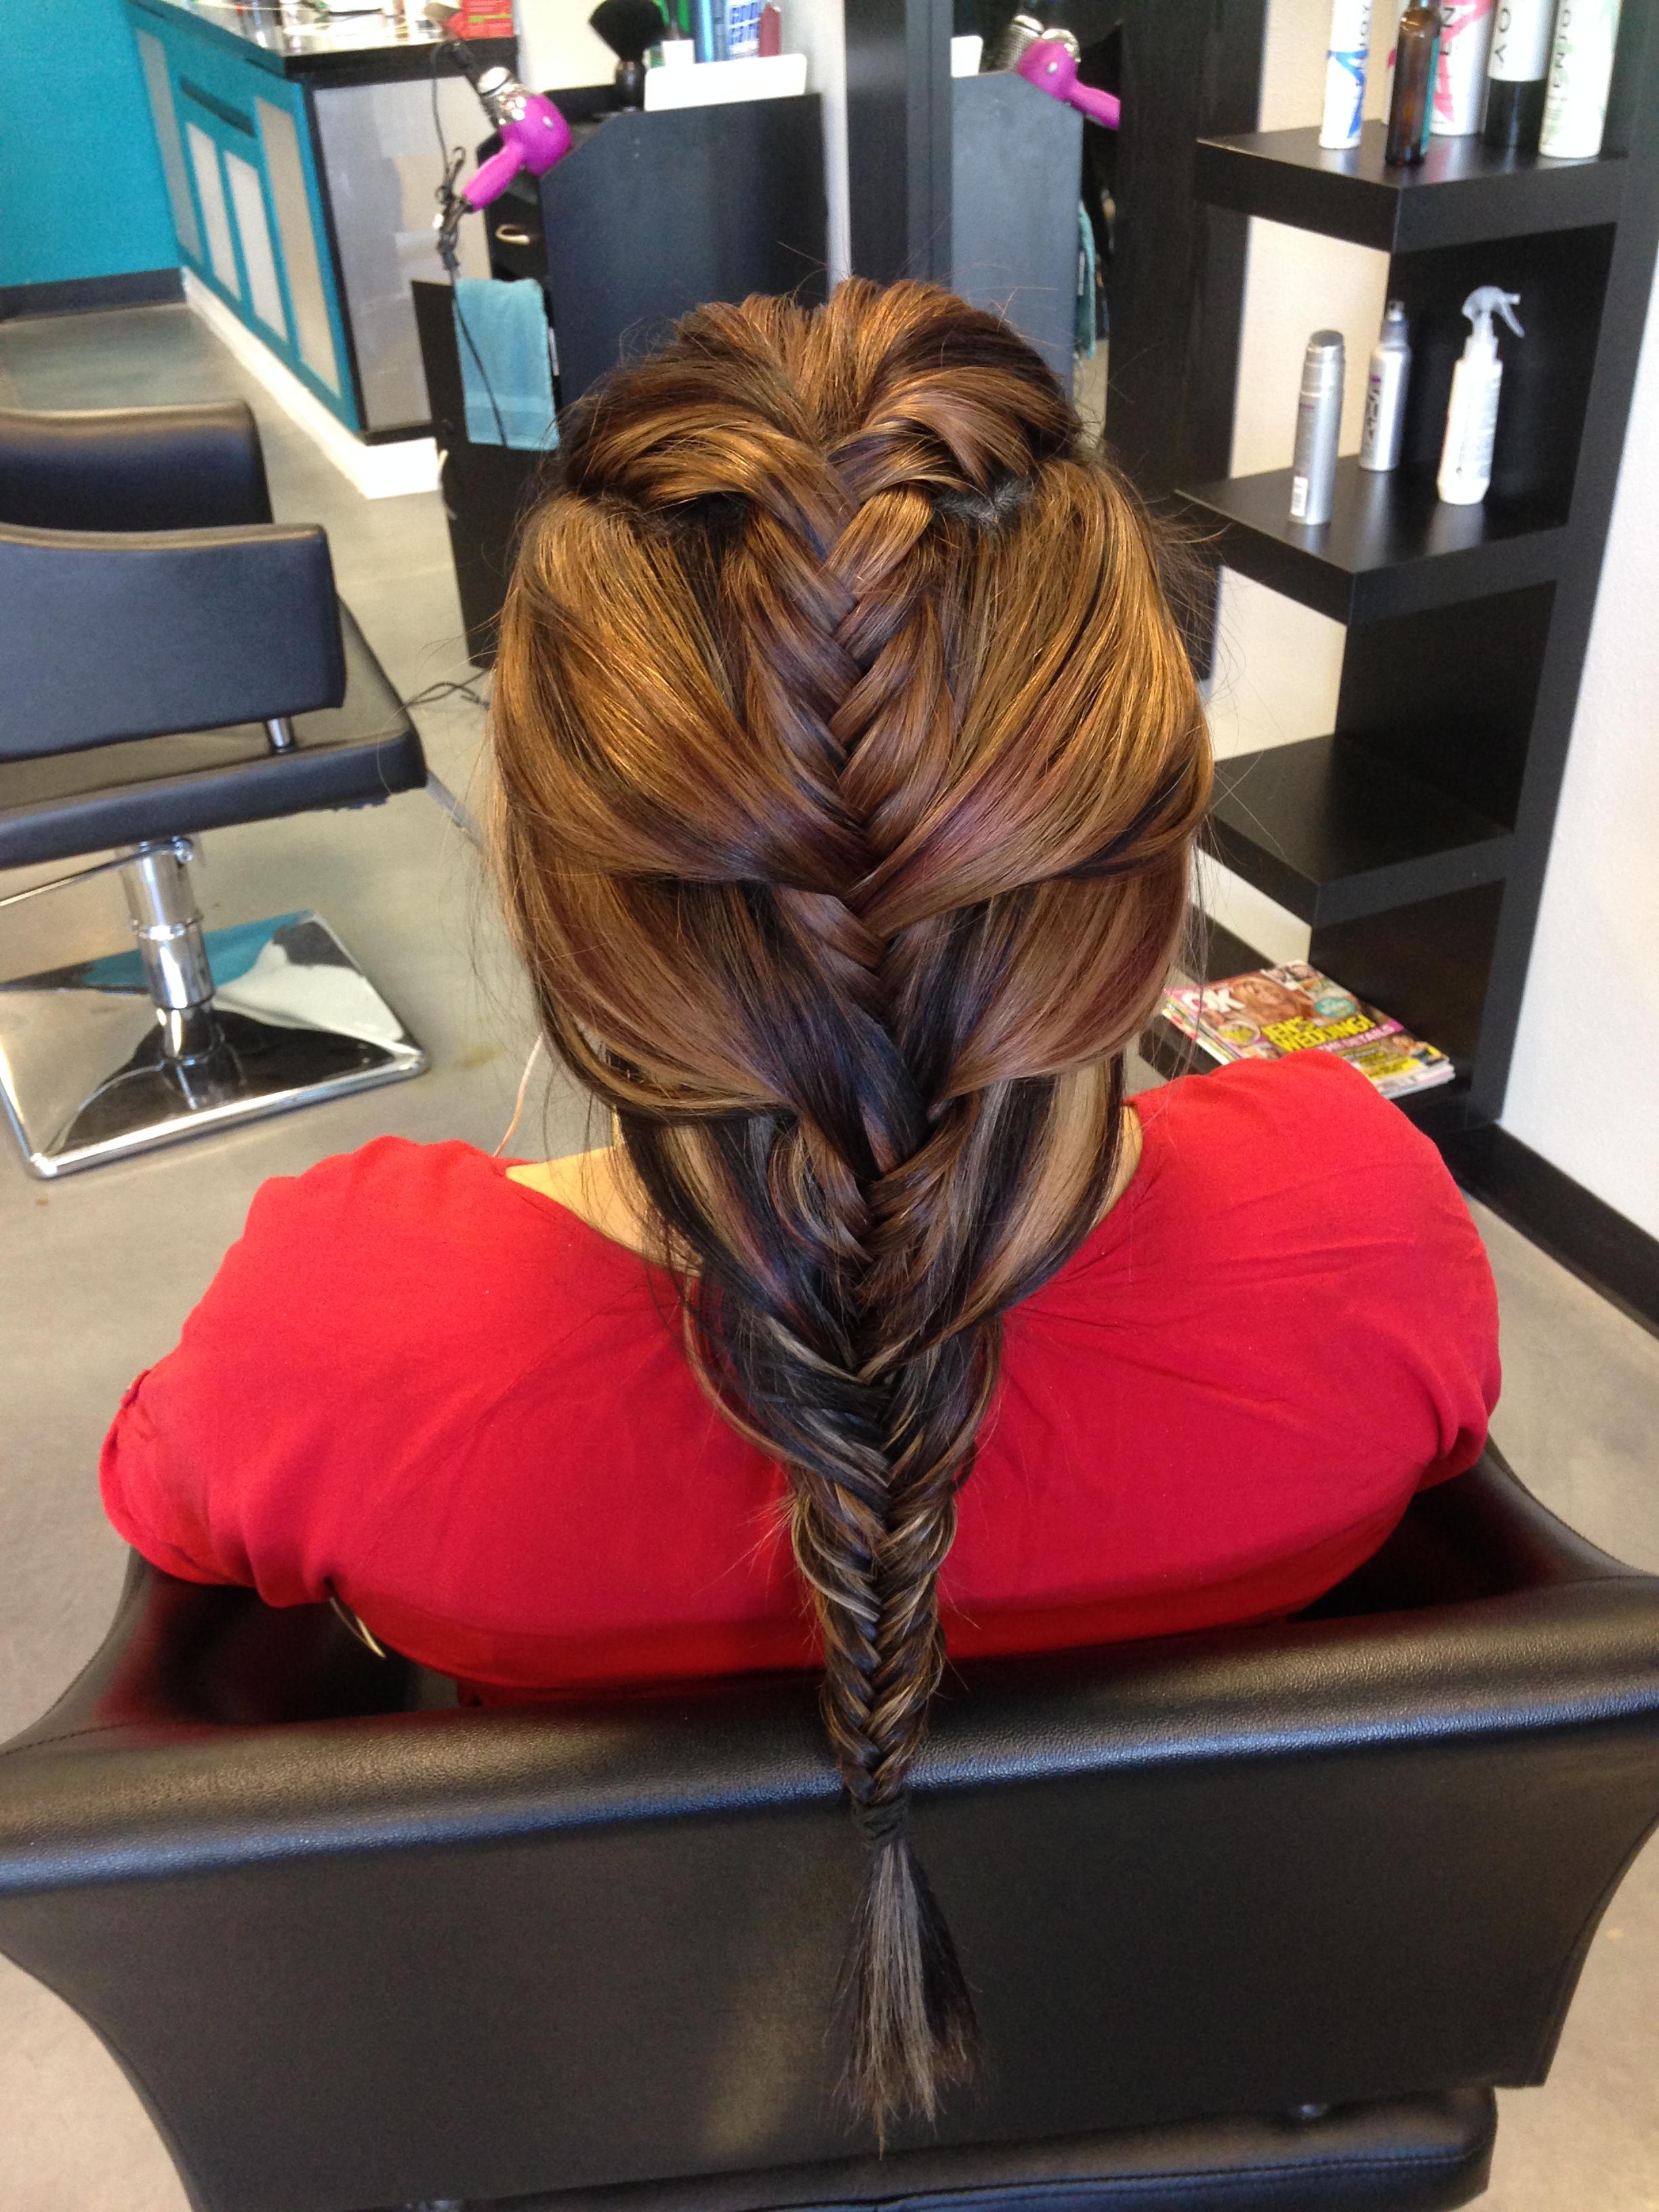 Braids in albuquerque yarn braids braids for little - Hair salon albuquerque ...